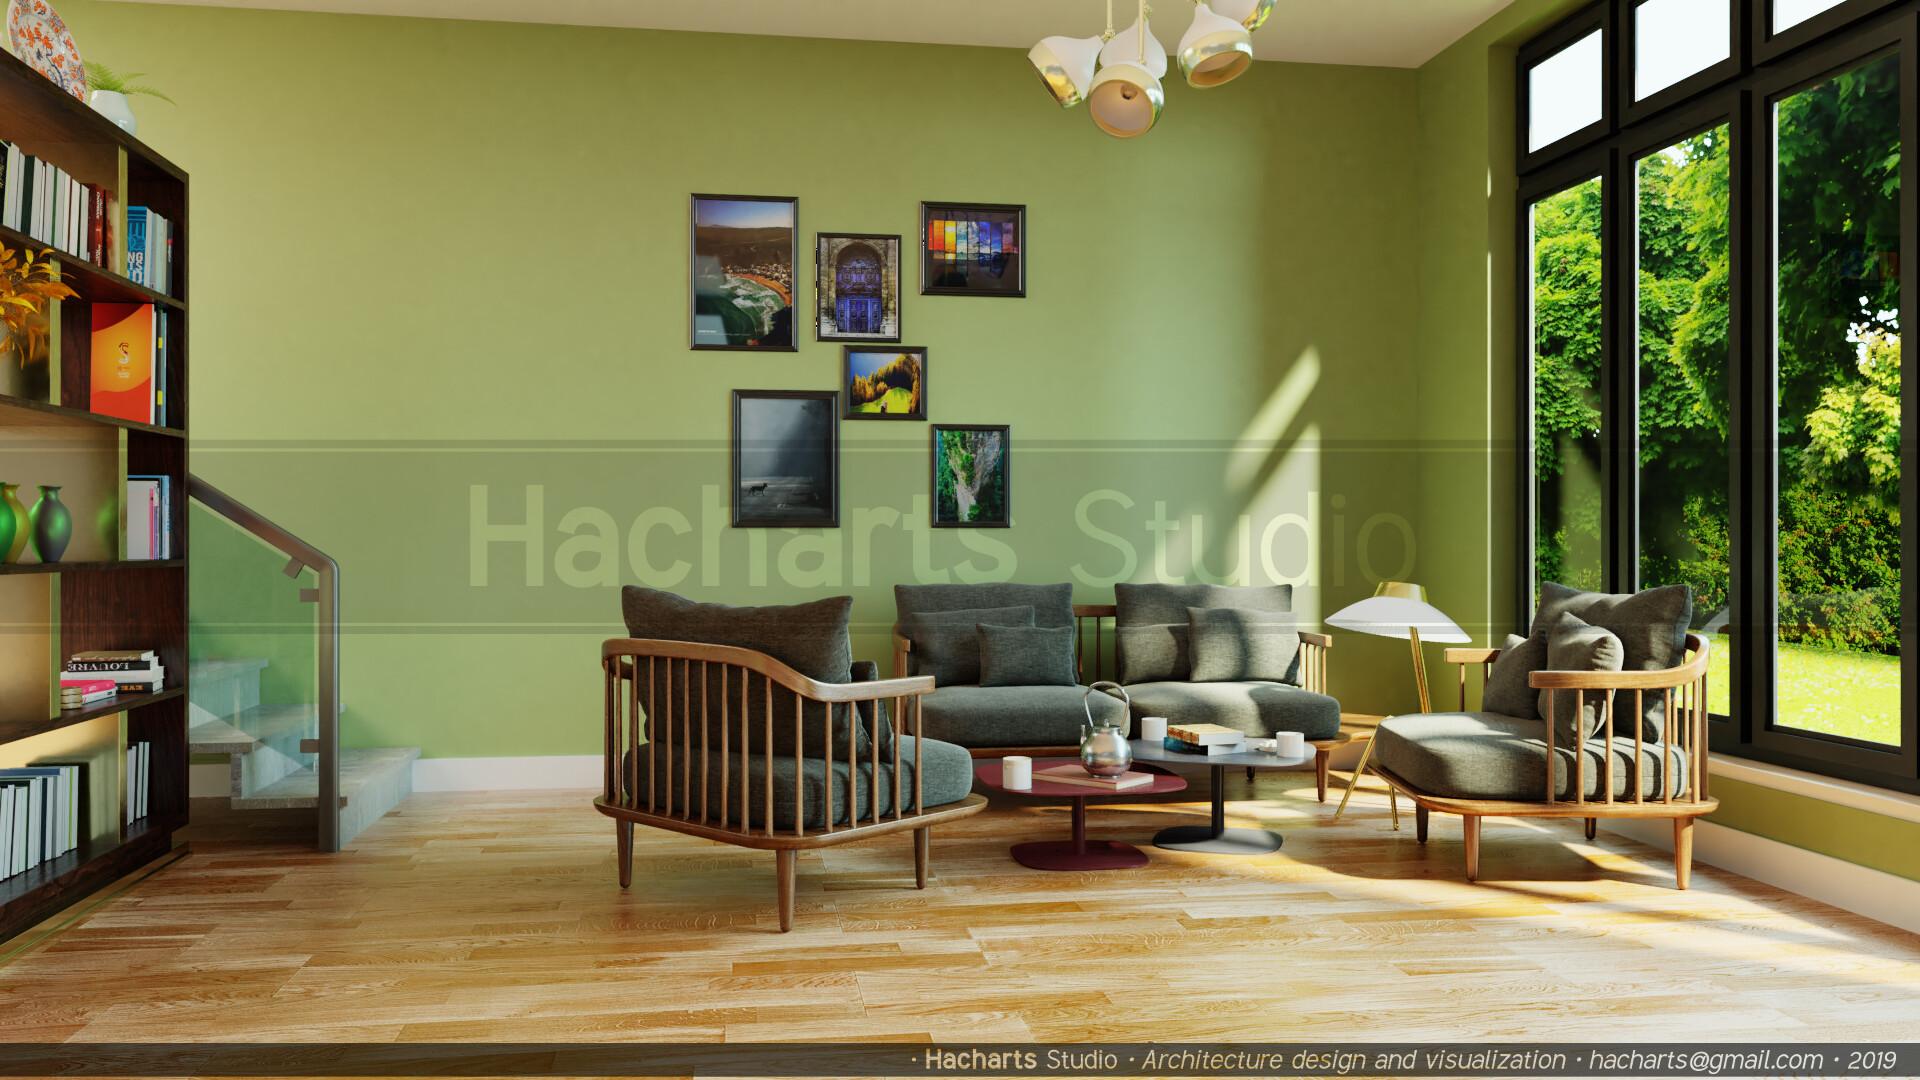 Moussa hachemi peaceful interior